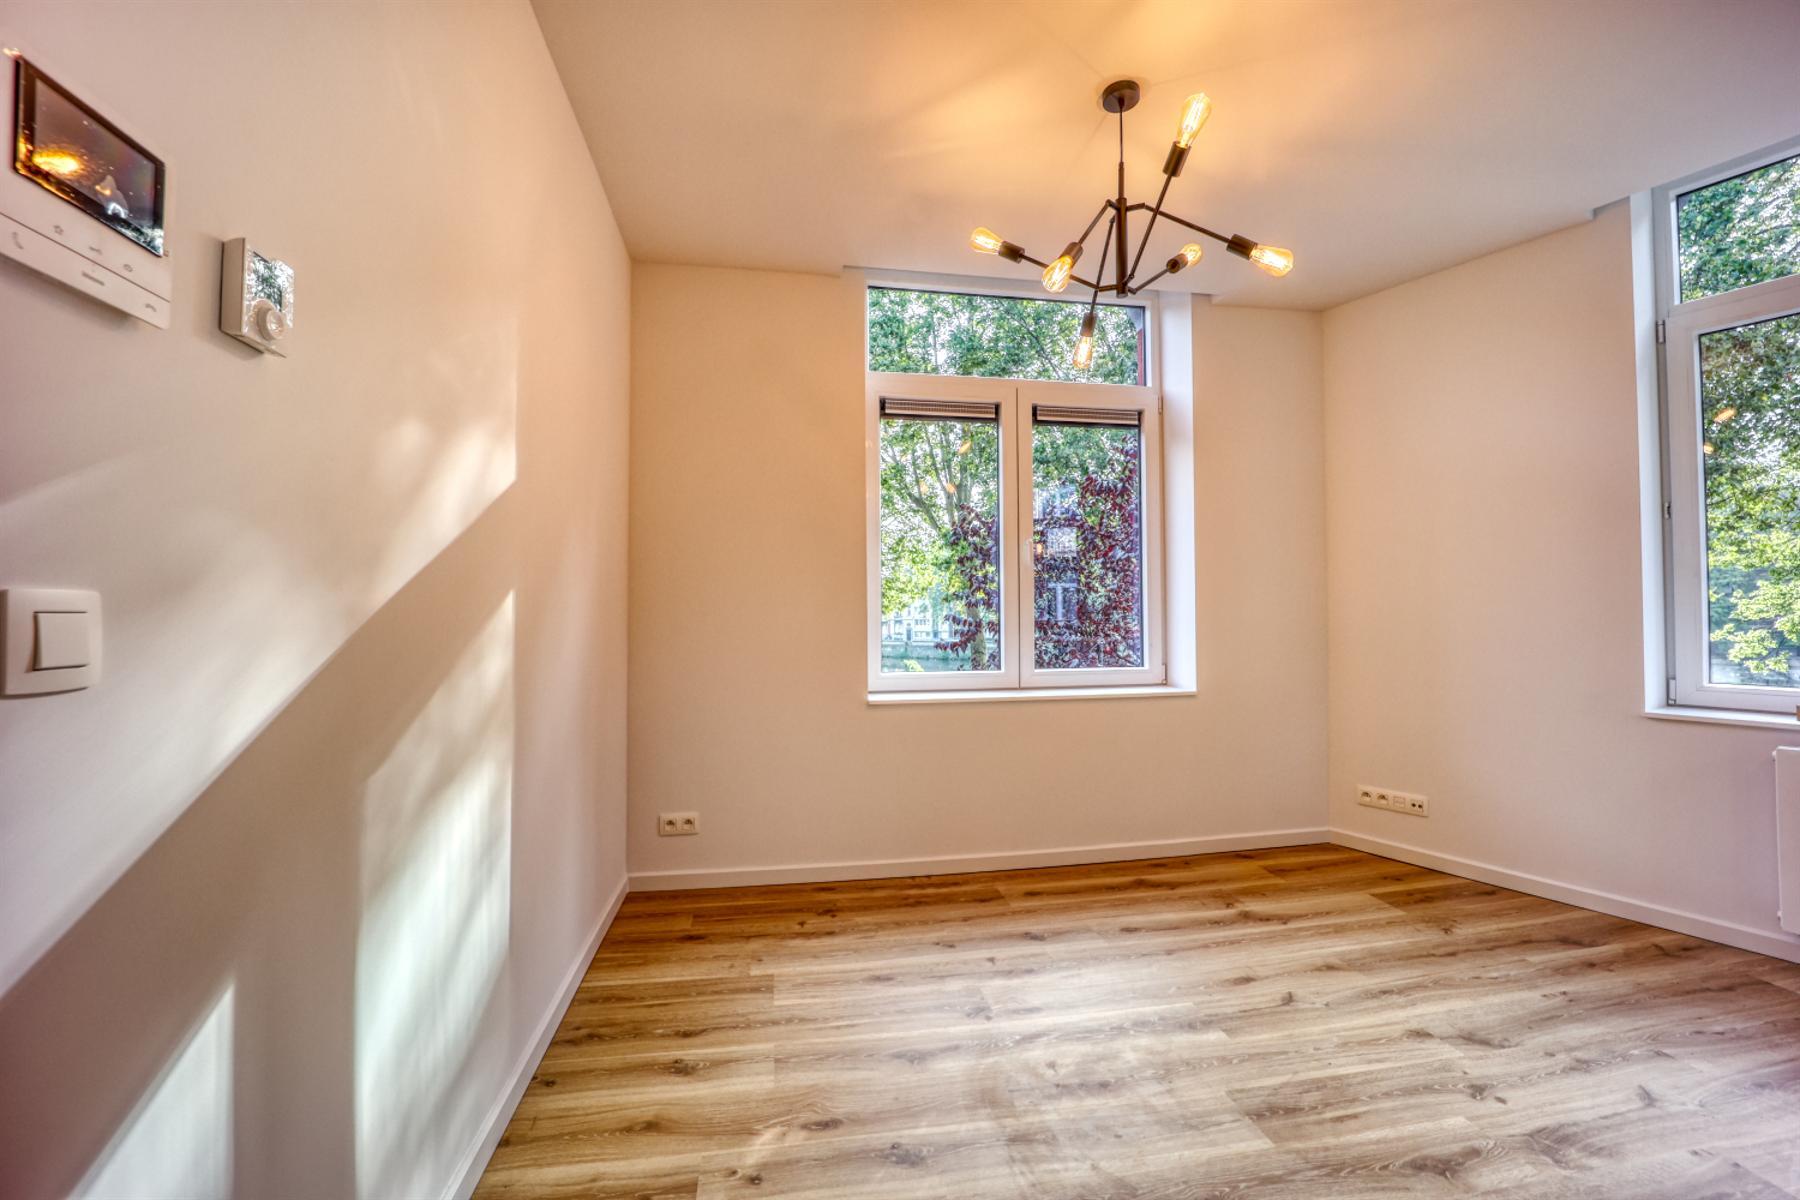 Appartement - Liège - #4512665-14